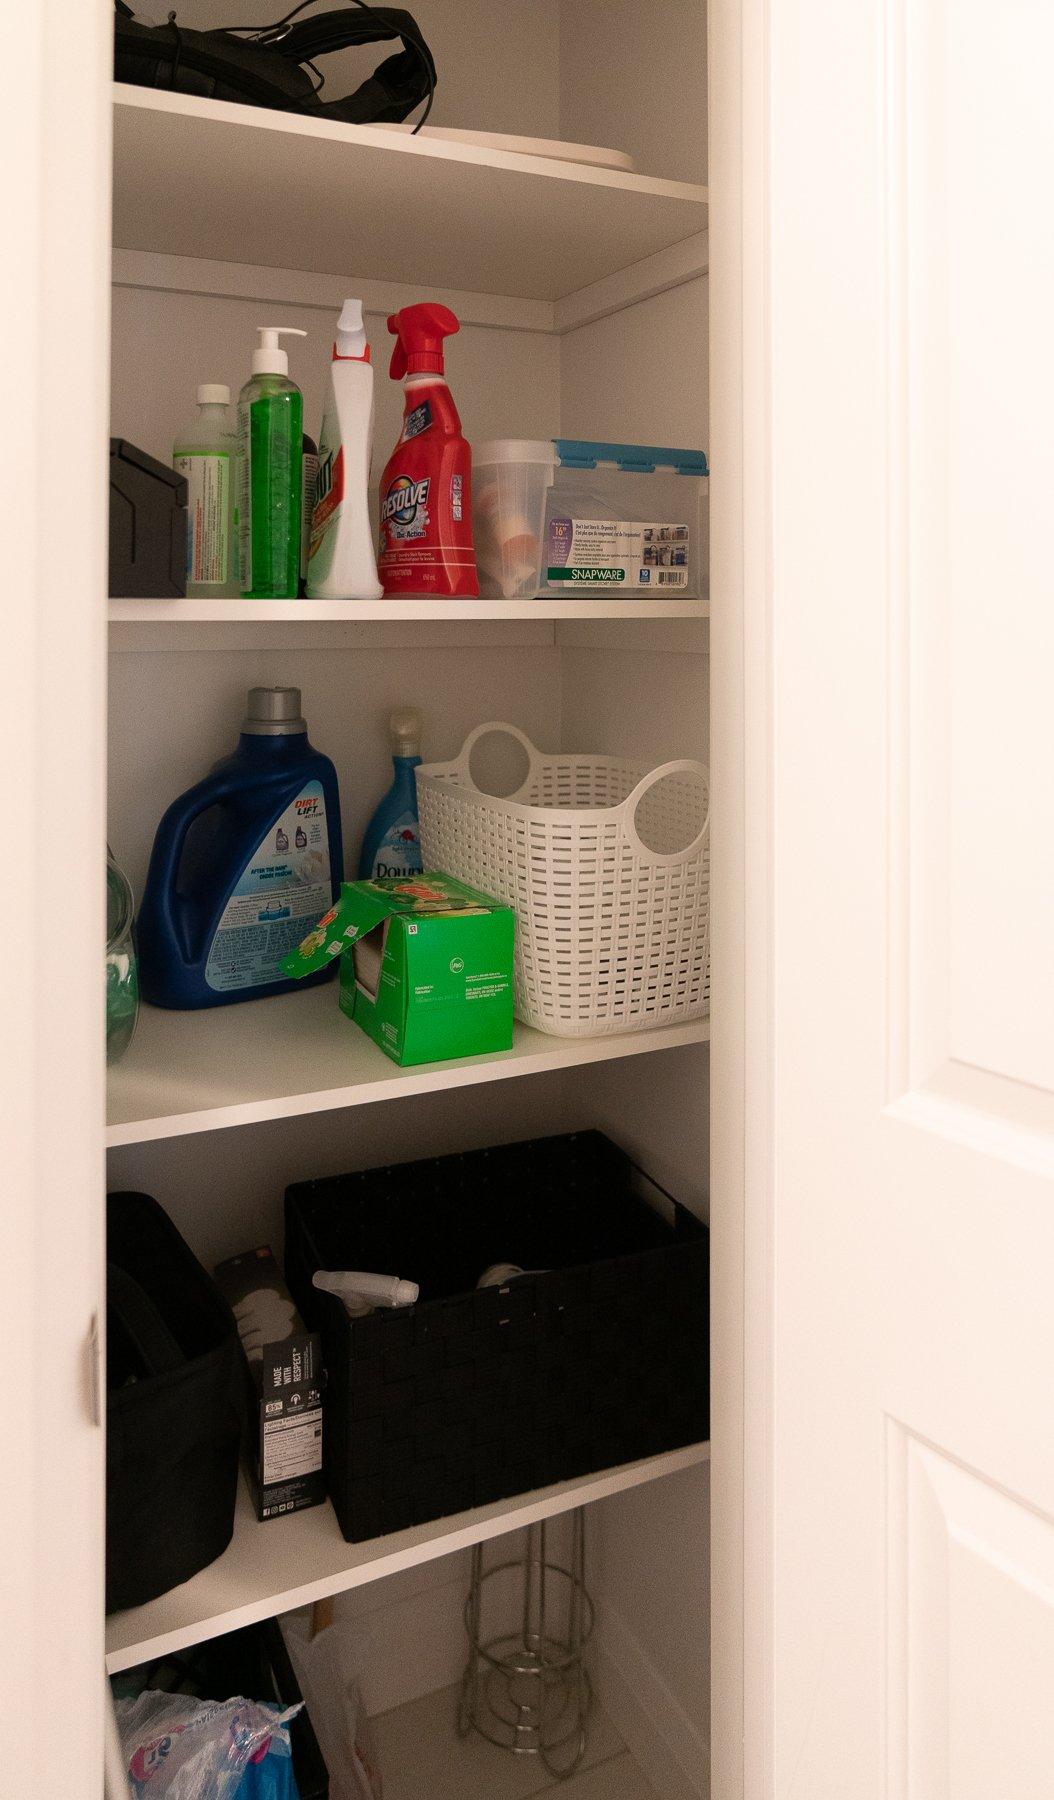 trish closet supplies before - LAUNDRY ROOM CLOSET